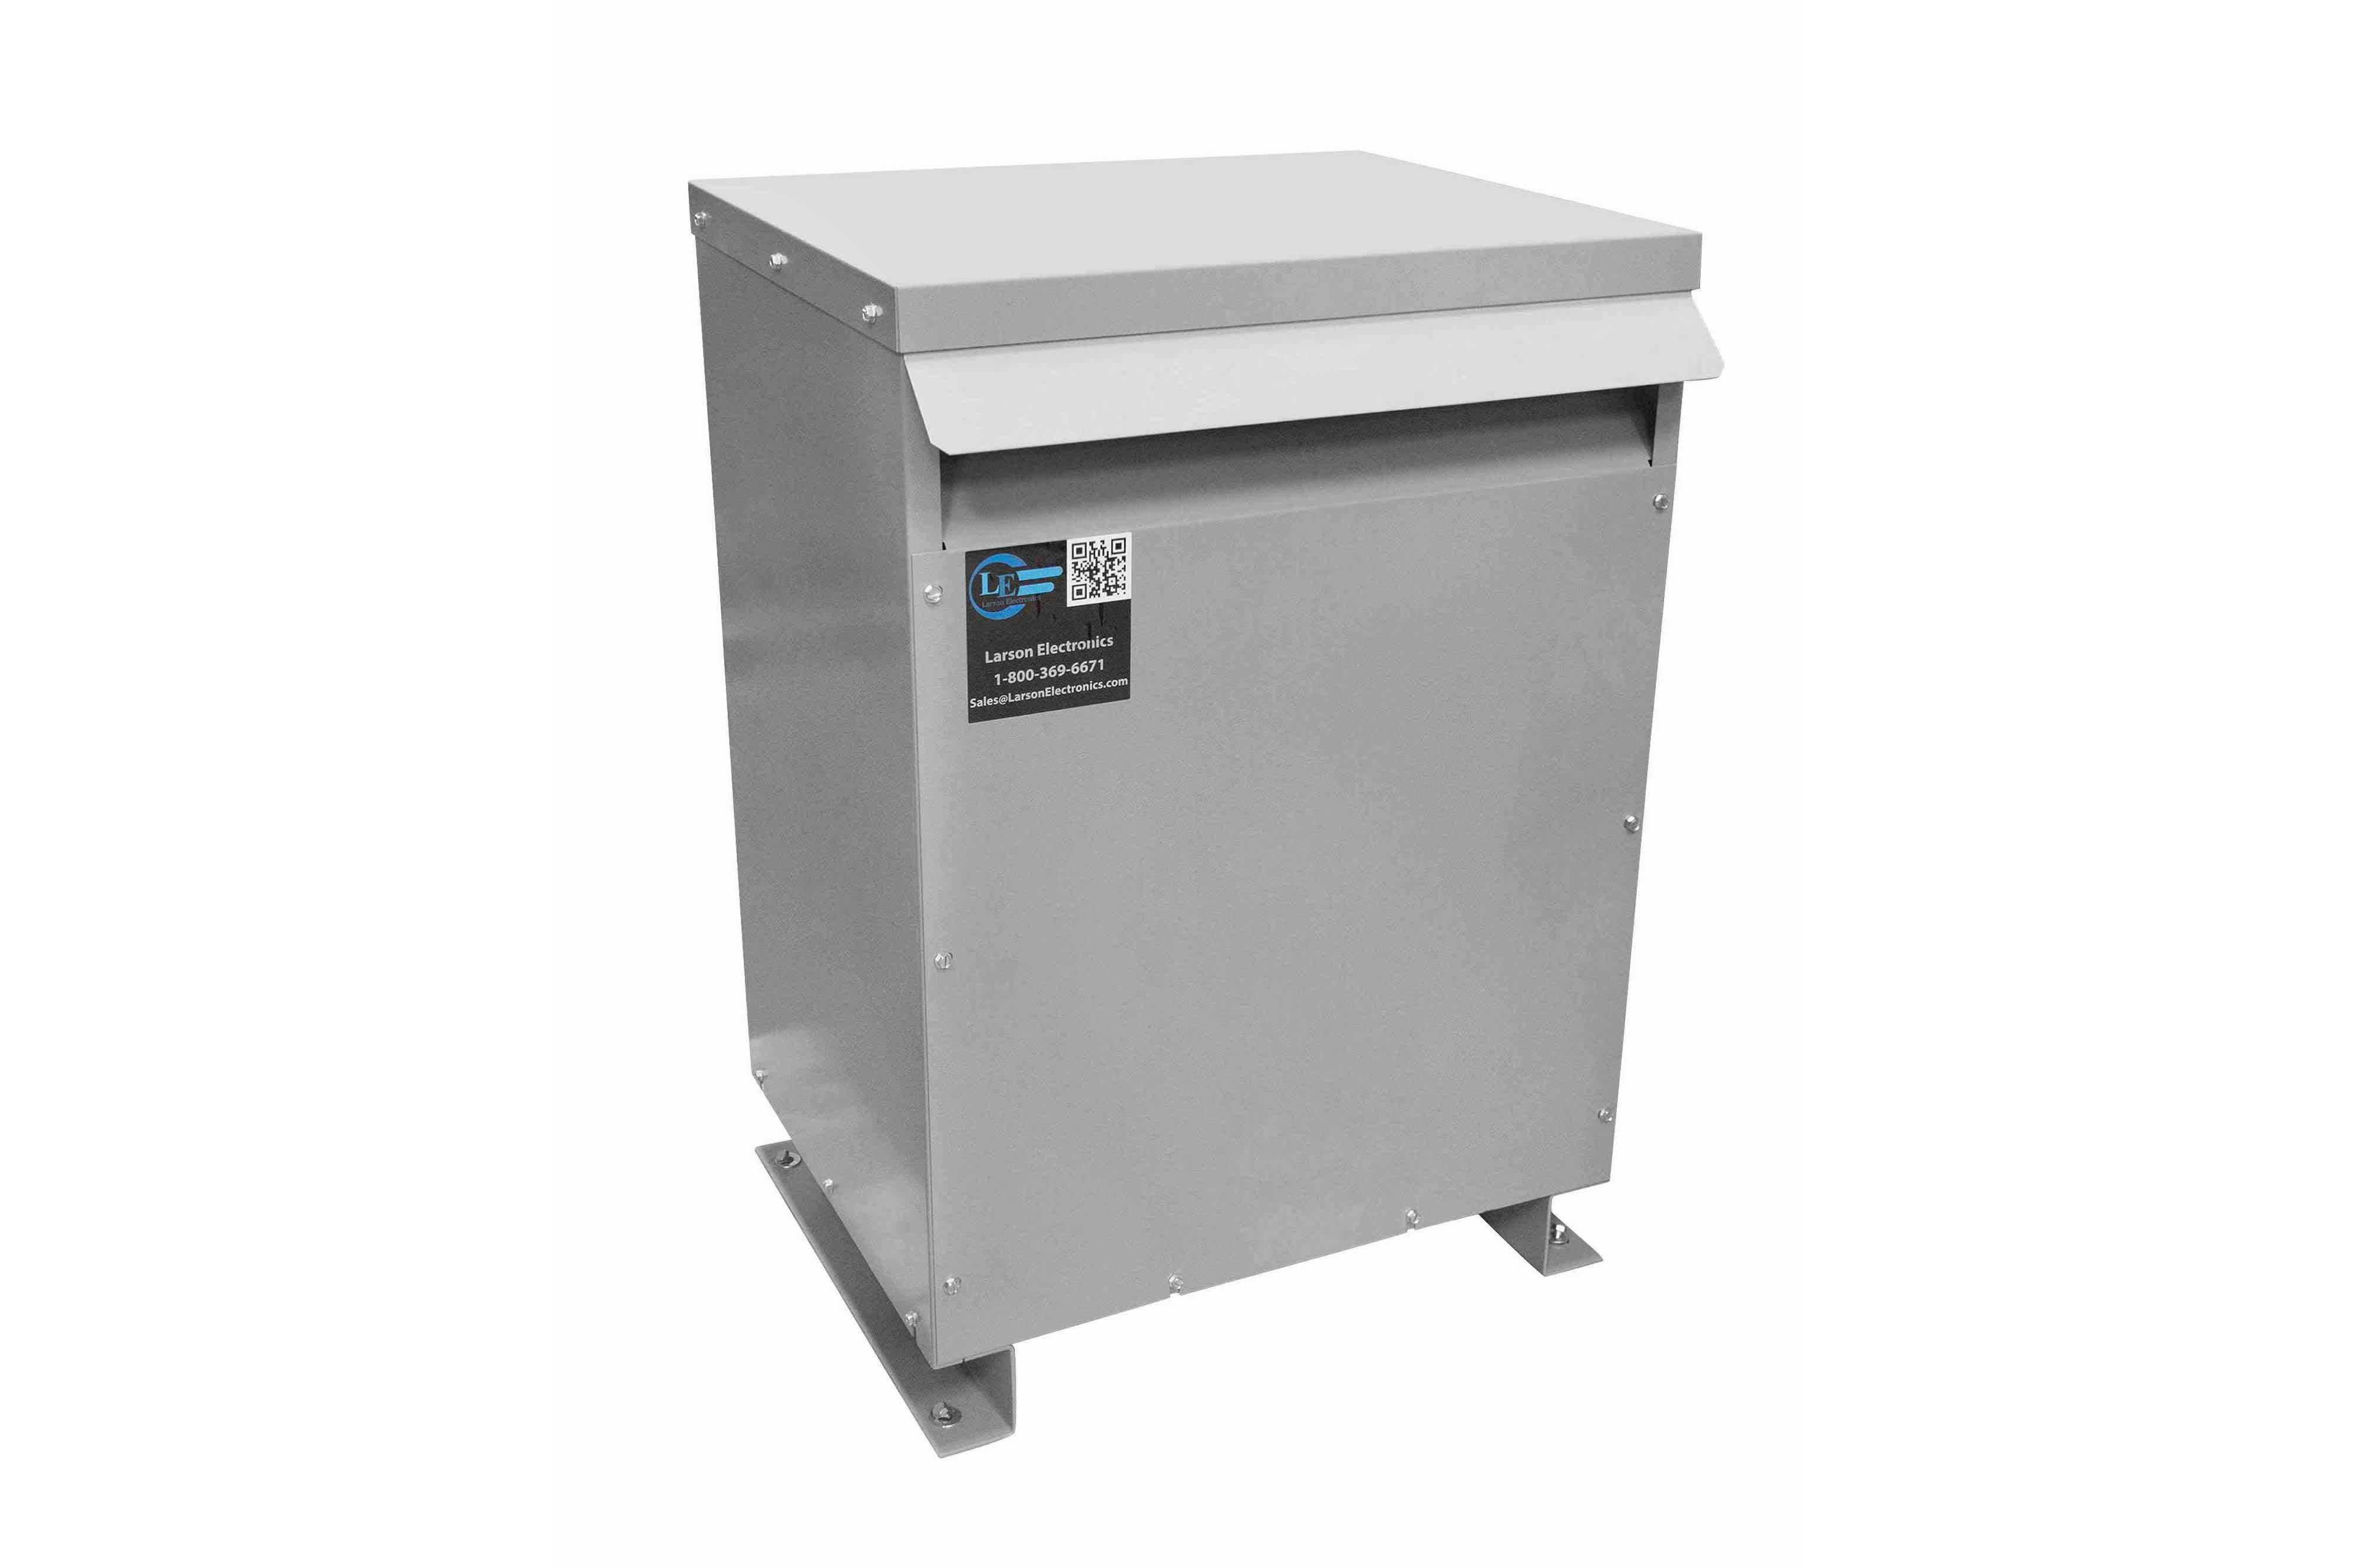 112.5 kVA 3PH Isolation Transformer, 575V Wye Primary, 480V Delta Secondary, N3R, Ventilated, 60 Hz